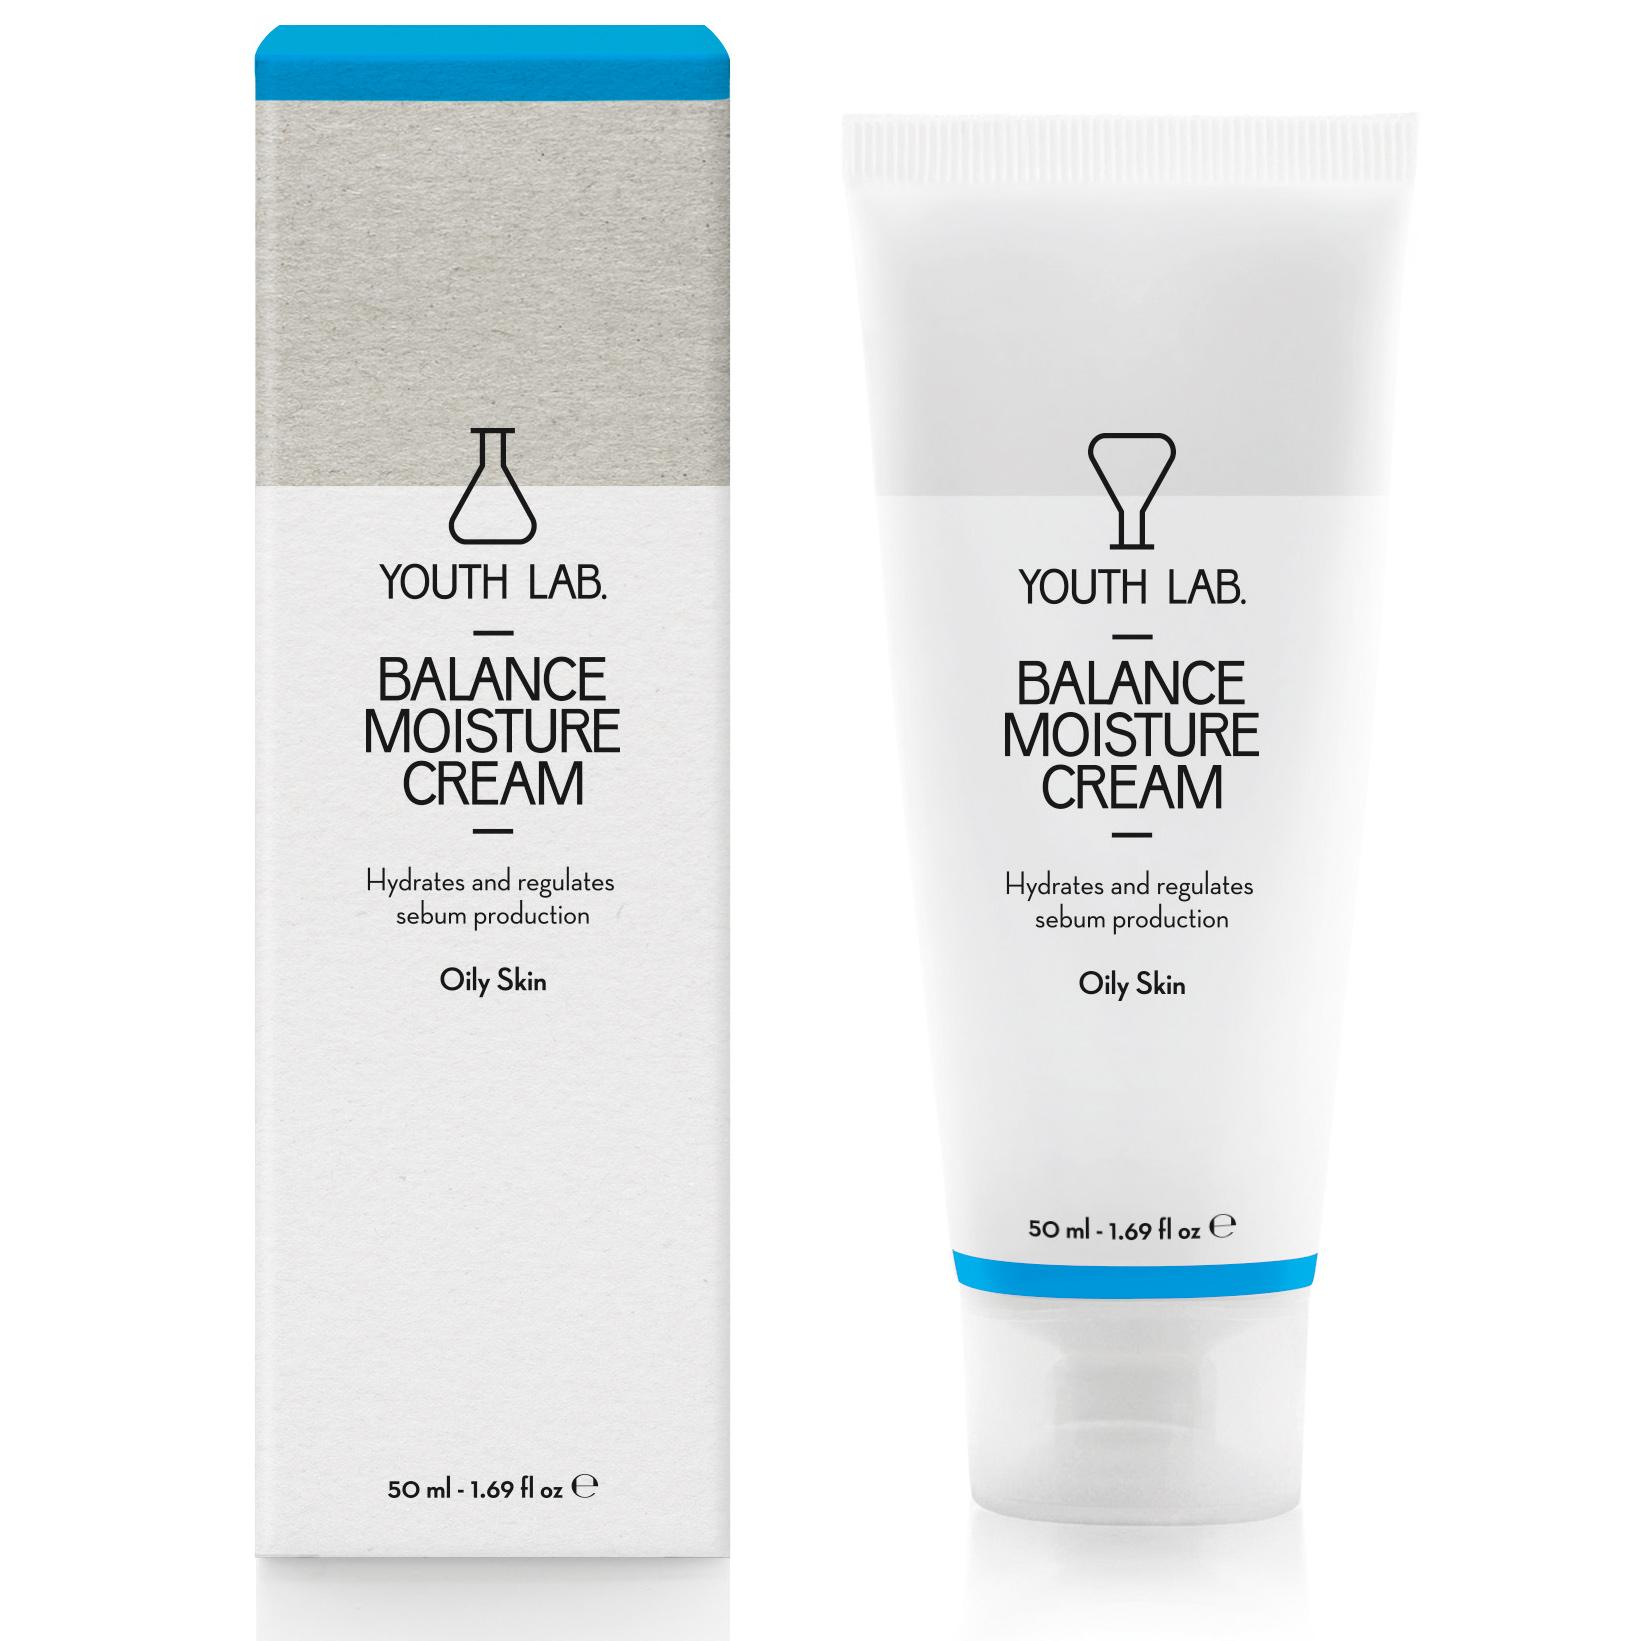 YOUTH LAB. Balance Moisture Cream Oily Skin Ρυθμιστική, Ενυδατική Κρέμα για Λιπαρή Επιδερμίδα με Τάση Ακμής 50ml